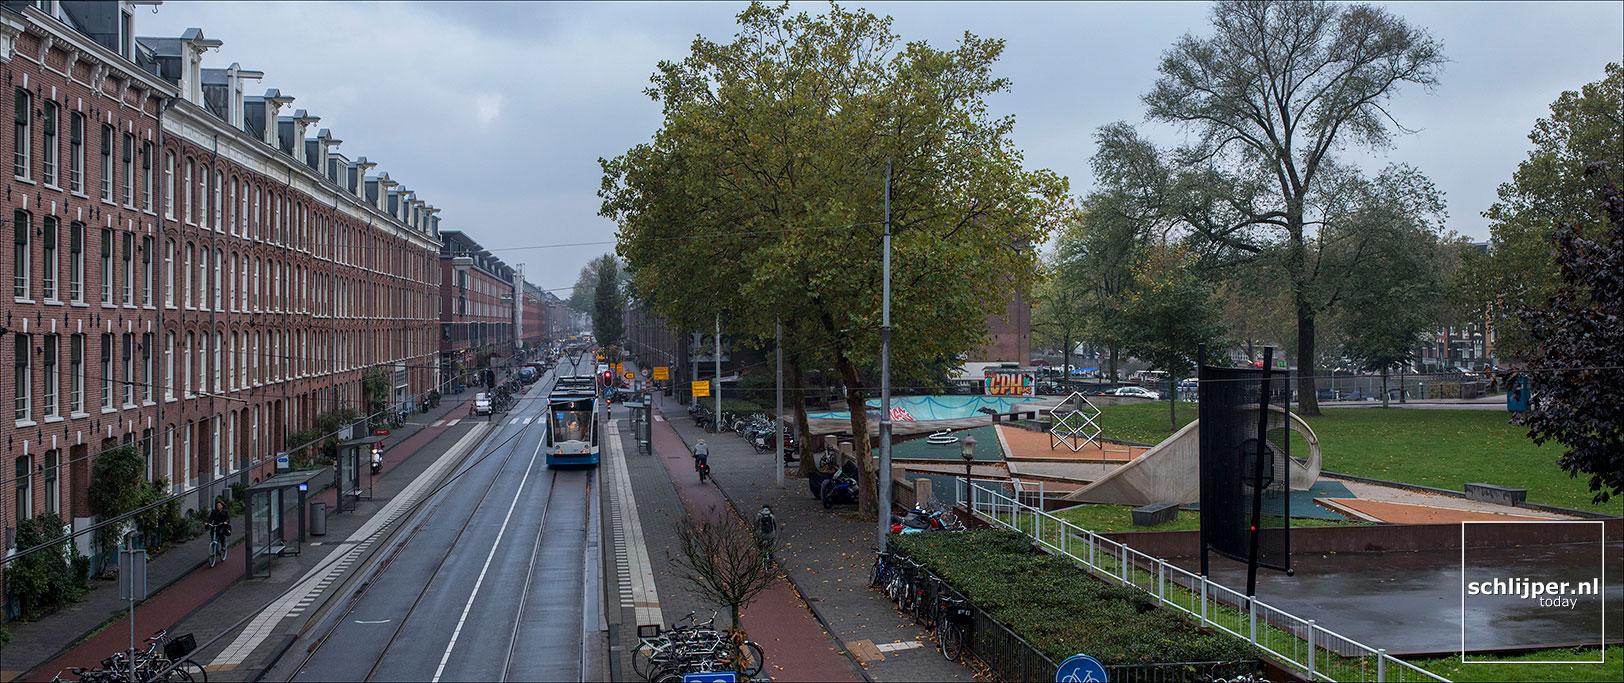 Nederland, Amsterdam, 26 oktober 2018